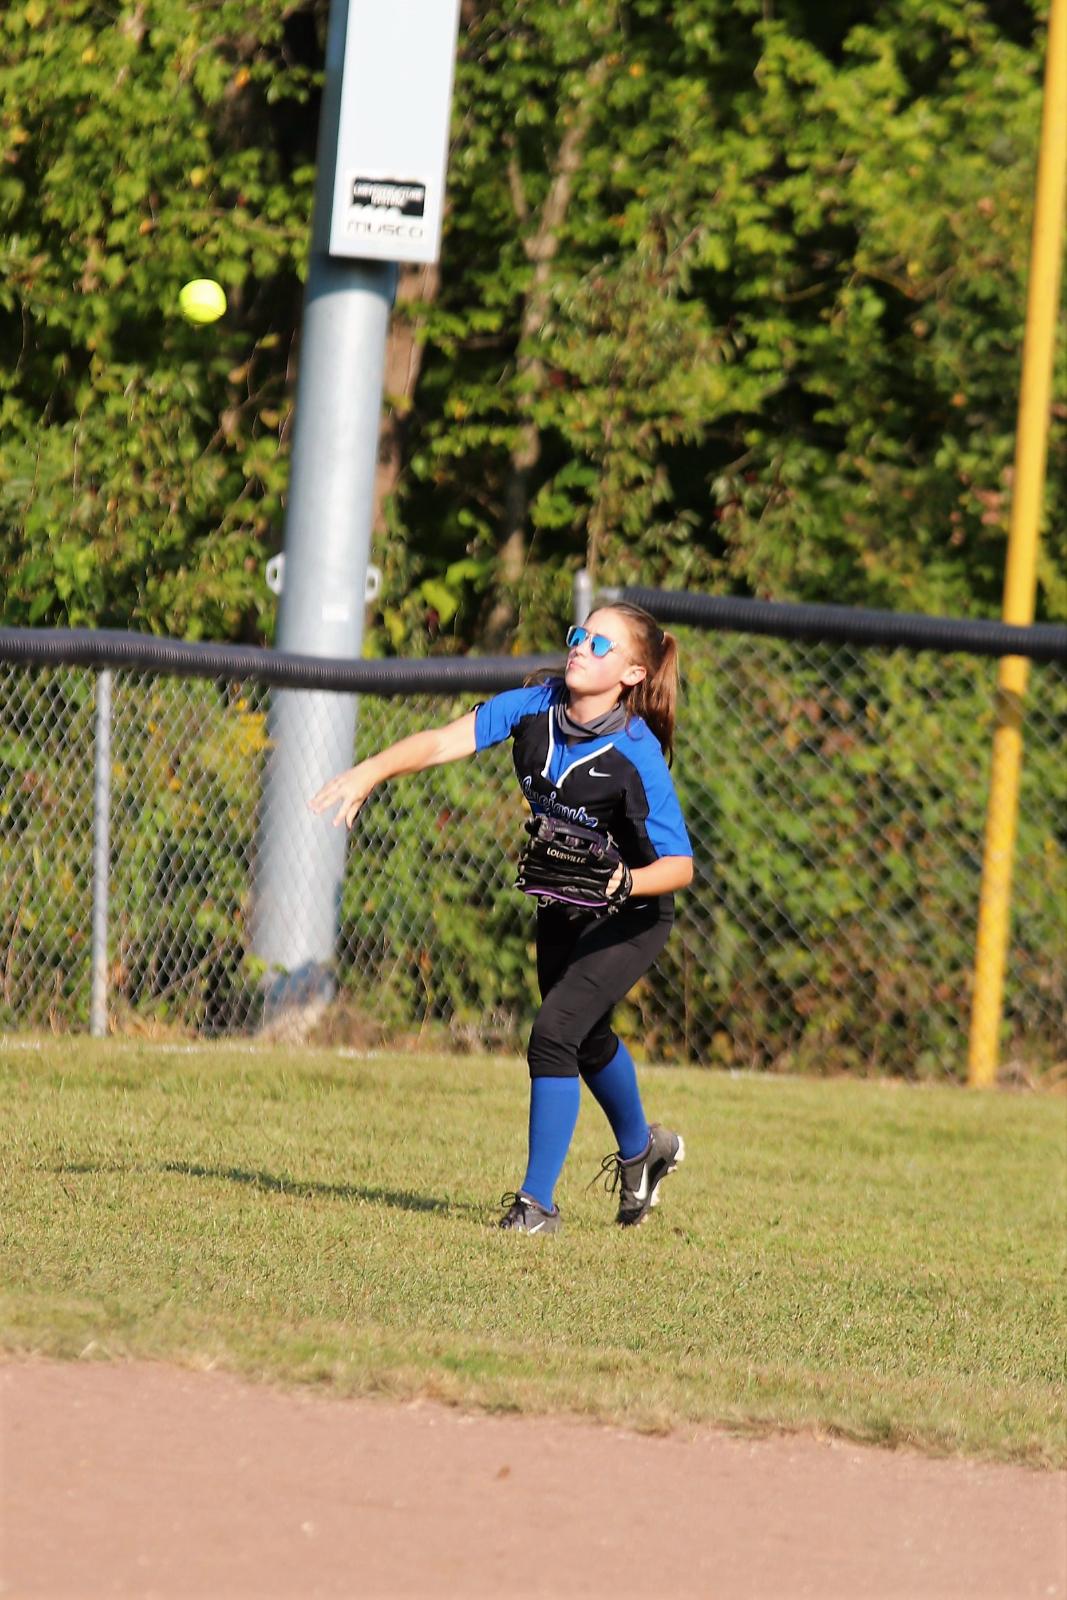 Varsity Softball vs Kelly 9/21/20